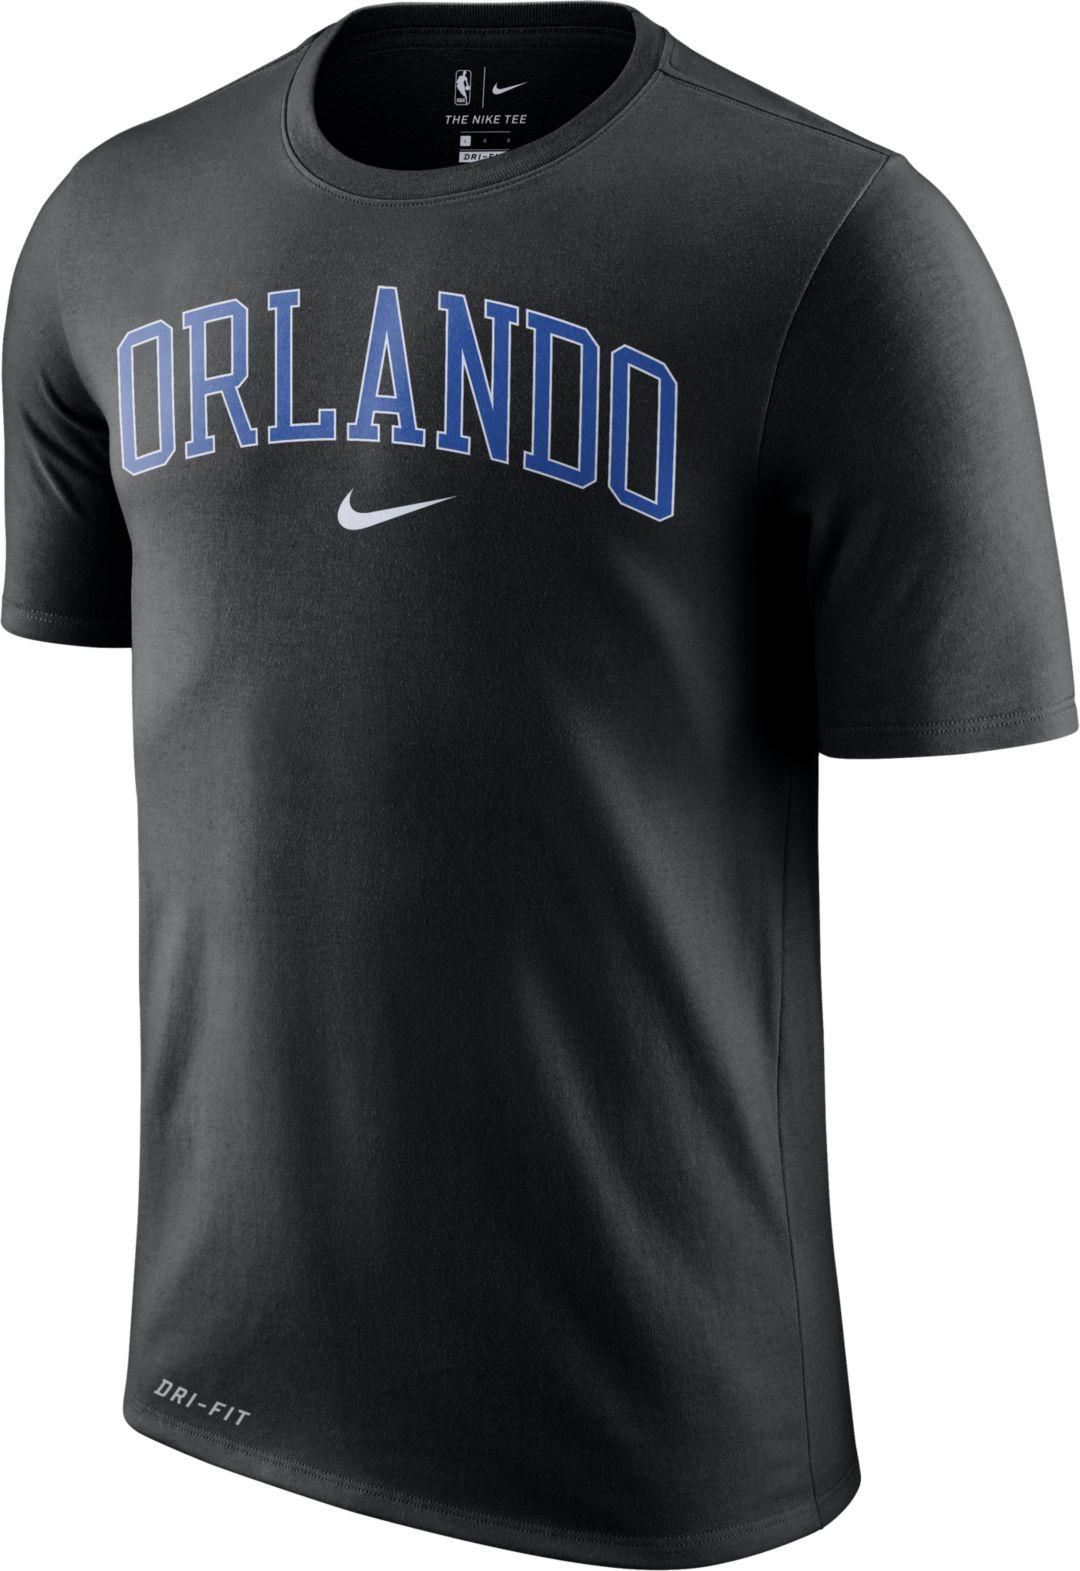 san francisco 24f82 2bc94 Nike Men's Orlando Magic Dri-FIT City T-Shirt